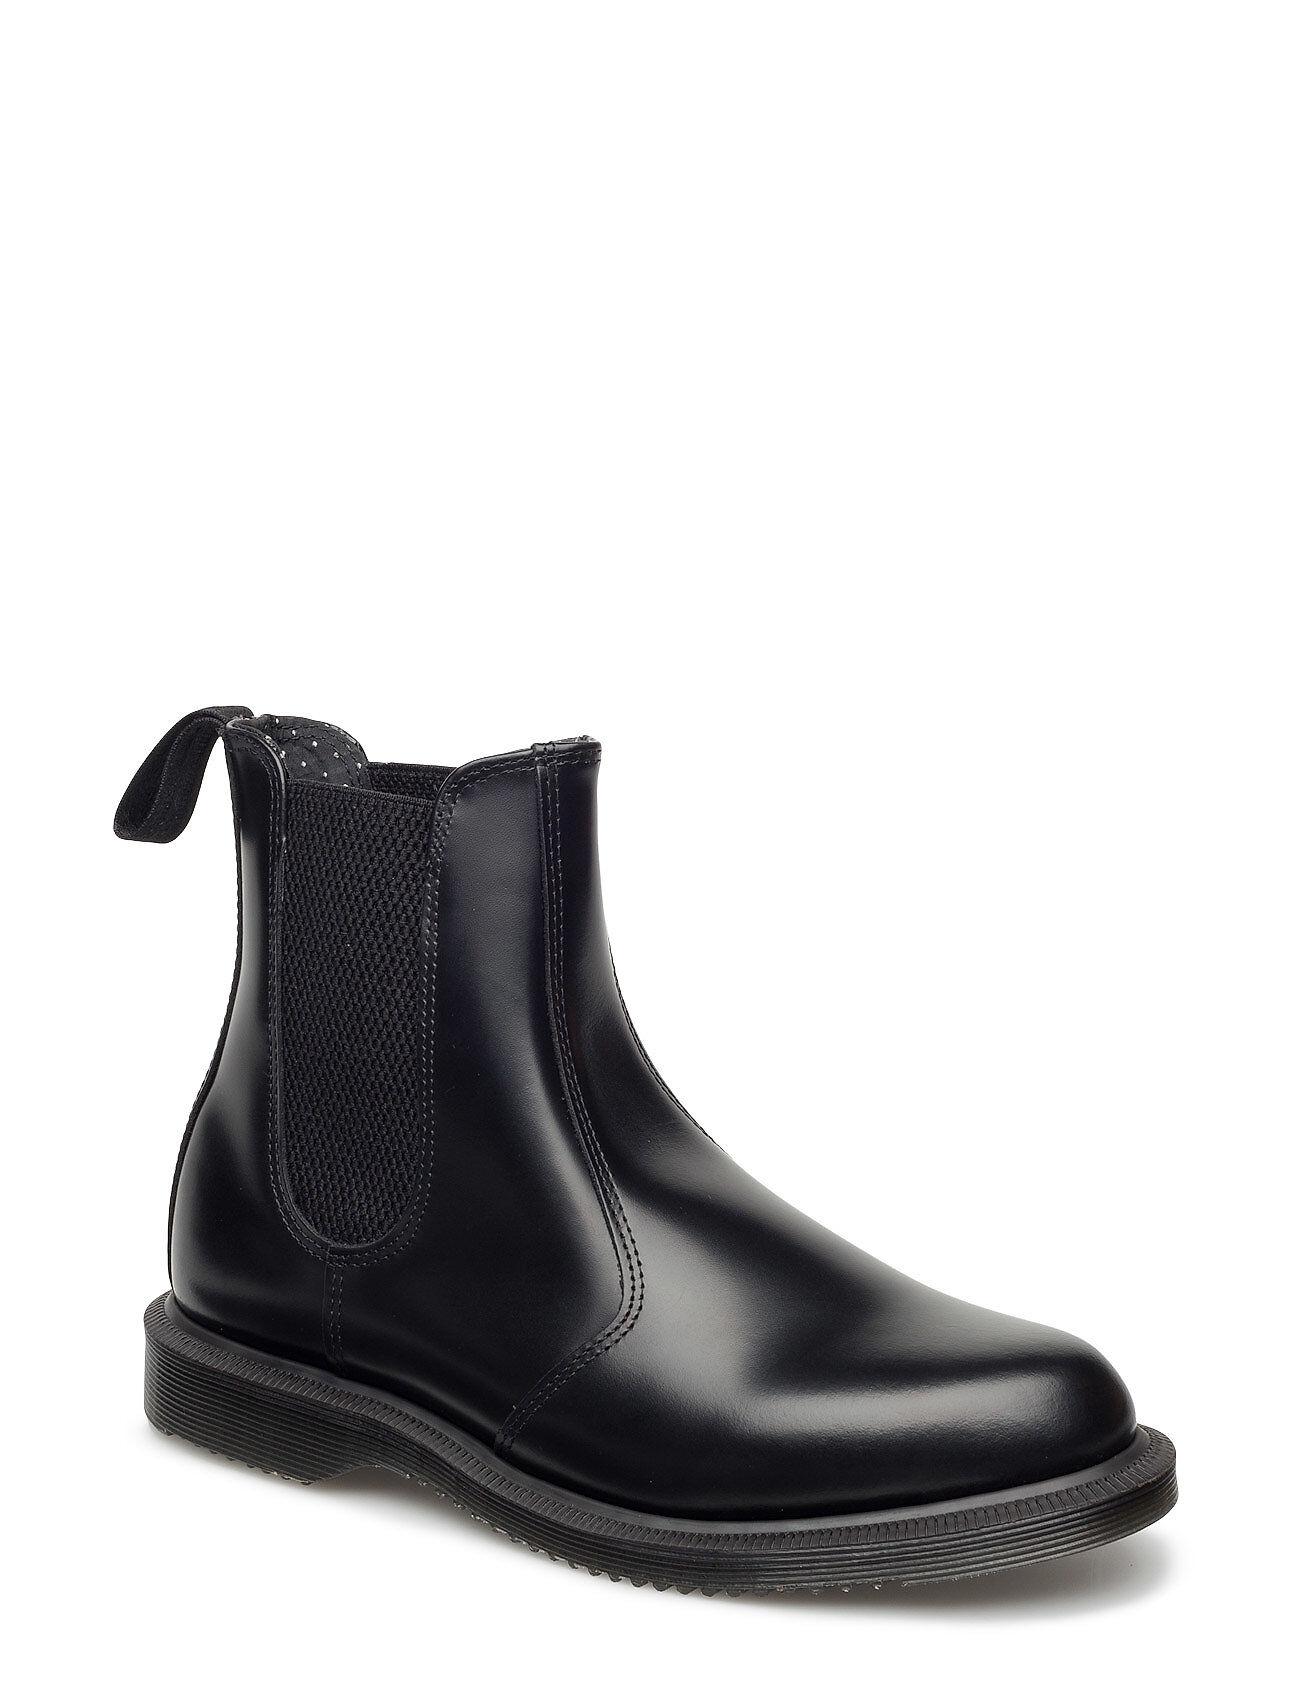 Image of Dr. Martens Flora Shoes Boots Ankle Boots Ankle Boots Flat Heel Musta Dr. Martens